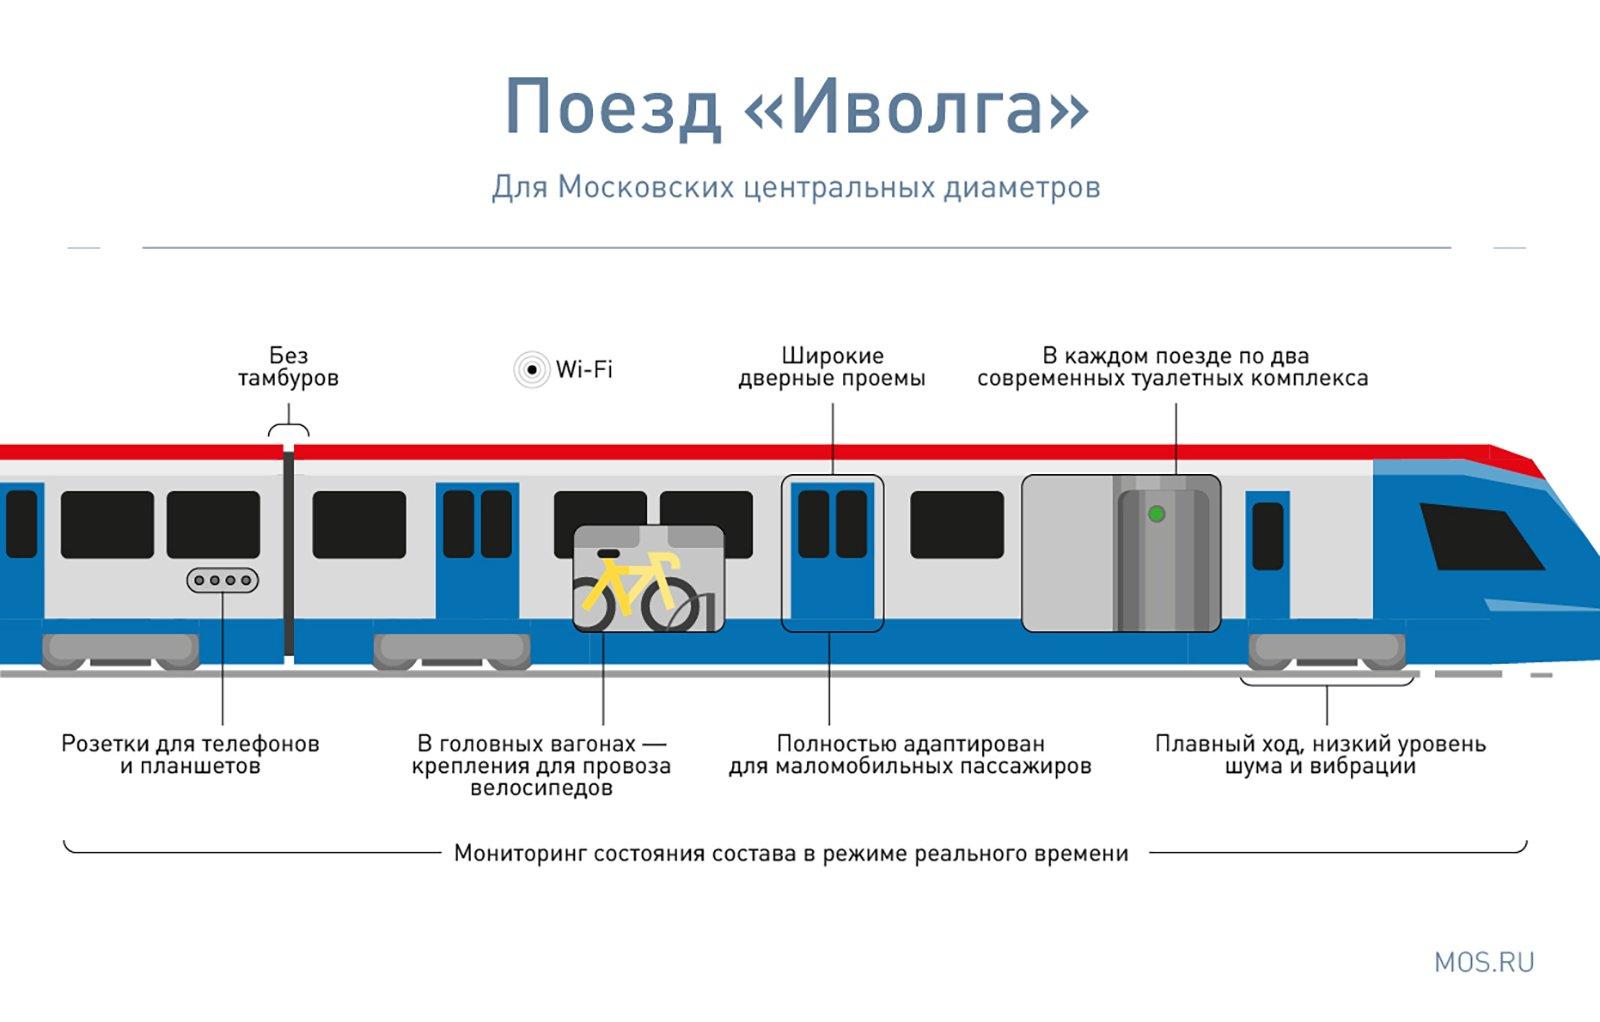 Скоро здесь будет пересадка: в метро начали объявлять о запуске МЦД